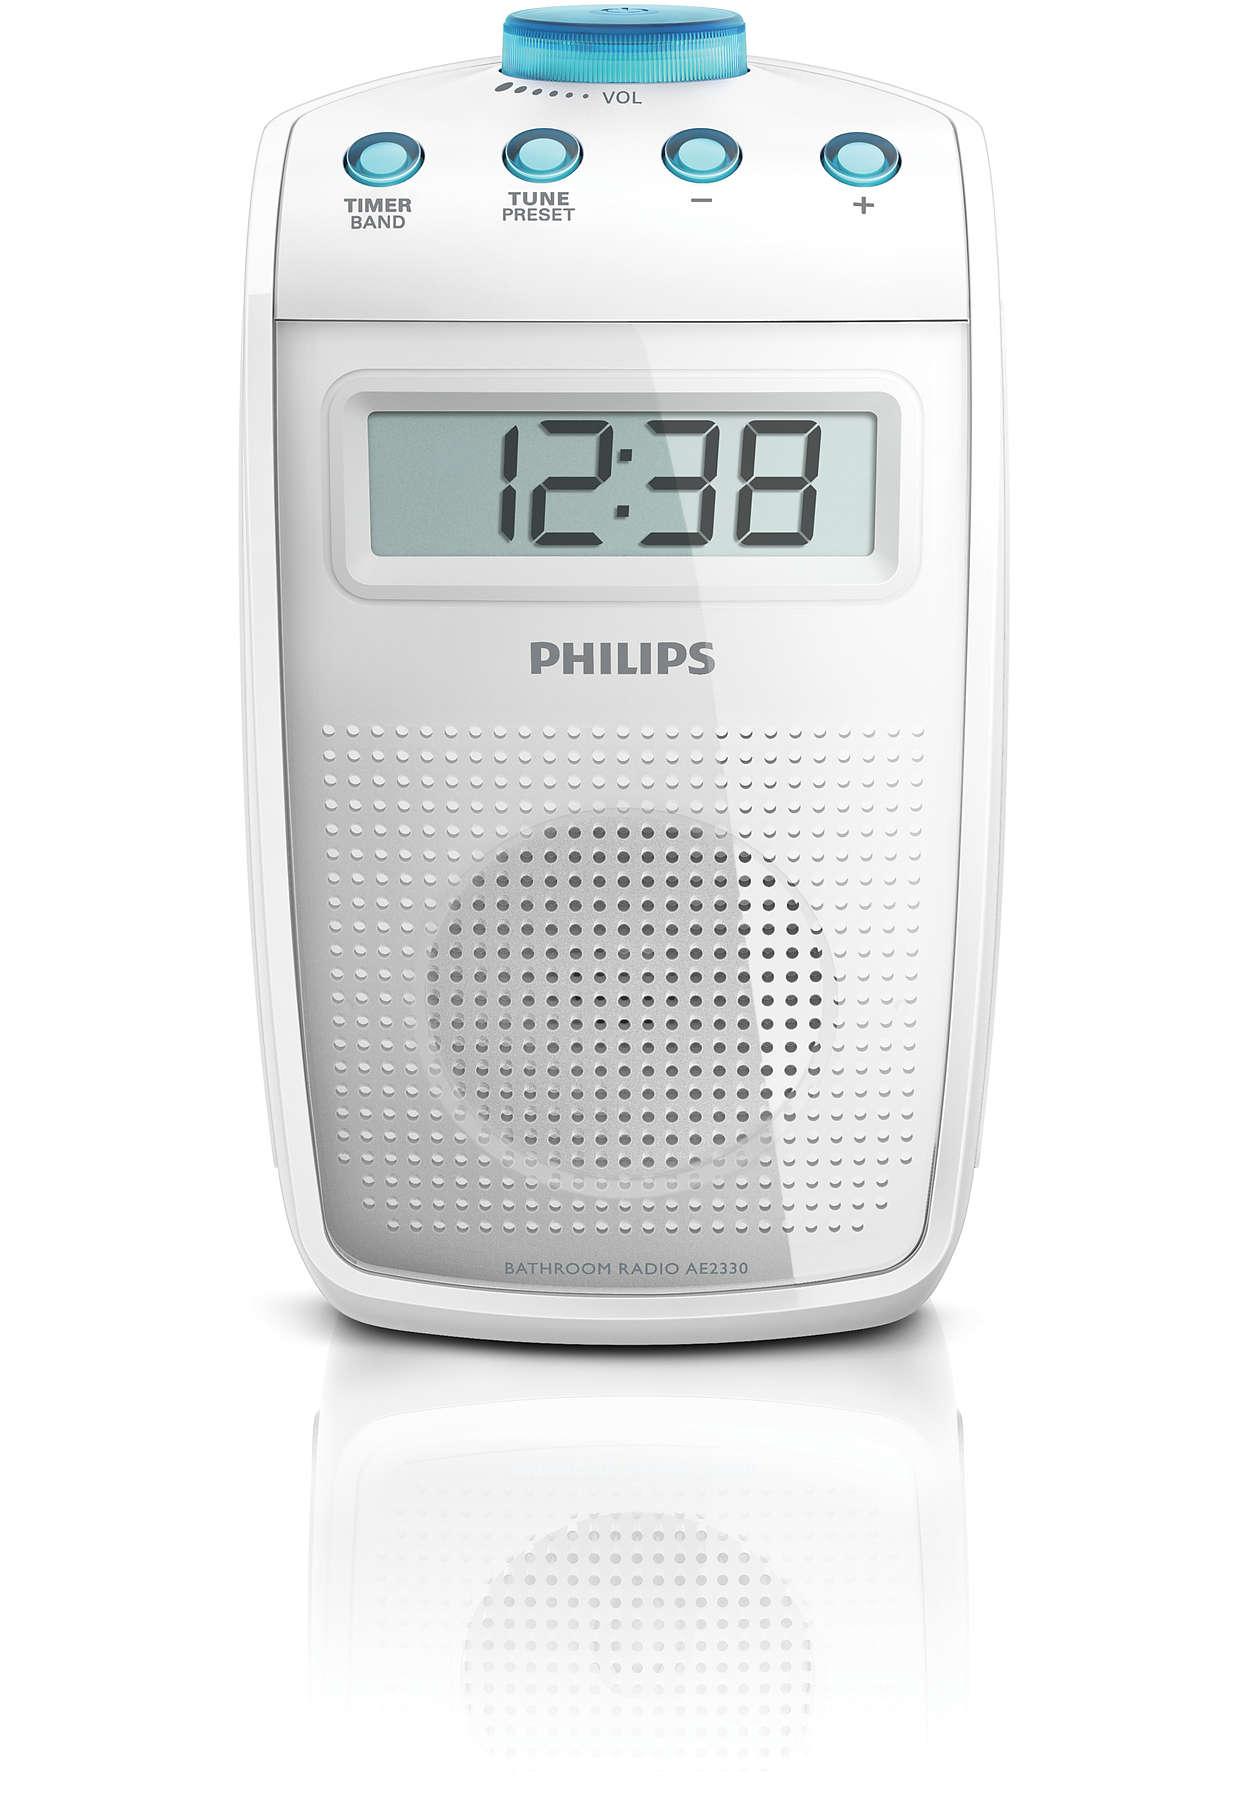 Radio de salle de bains ae2330 00 philips for Radio etanche salle de bain